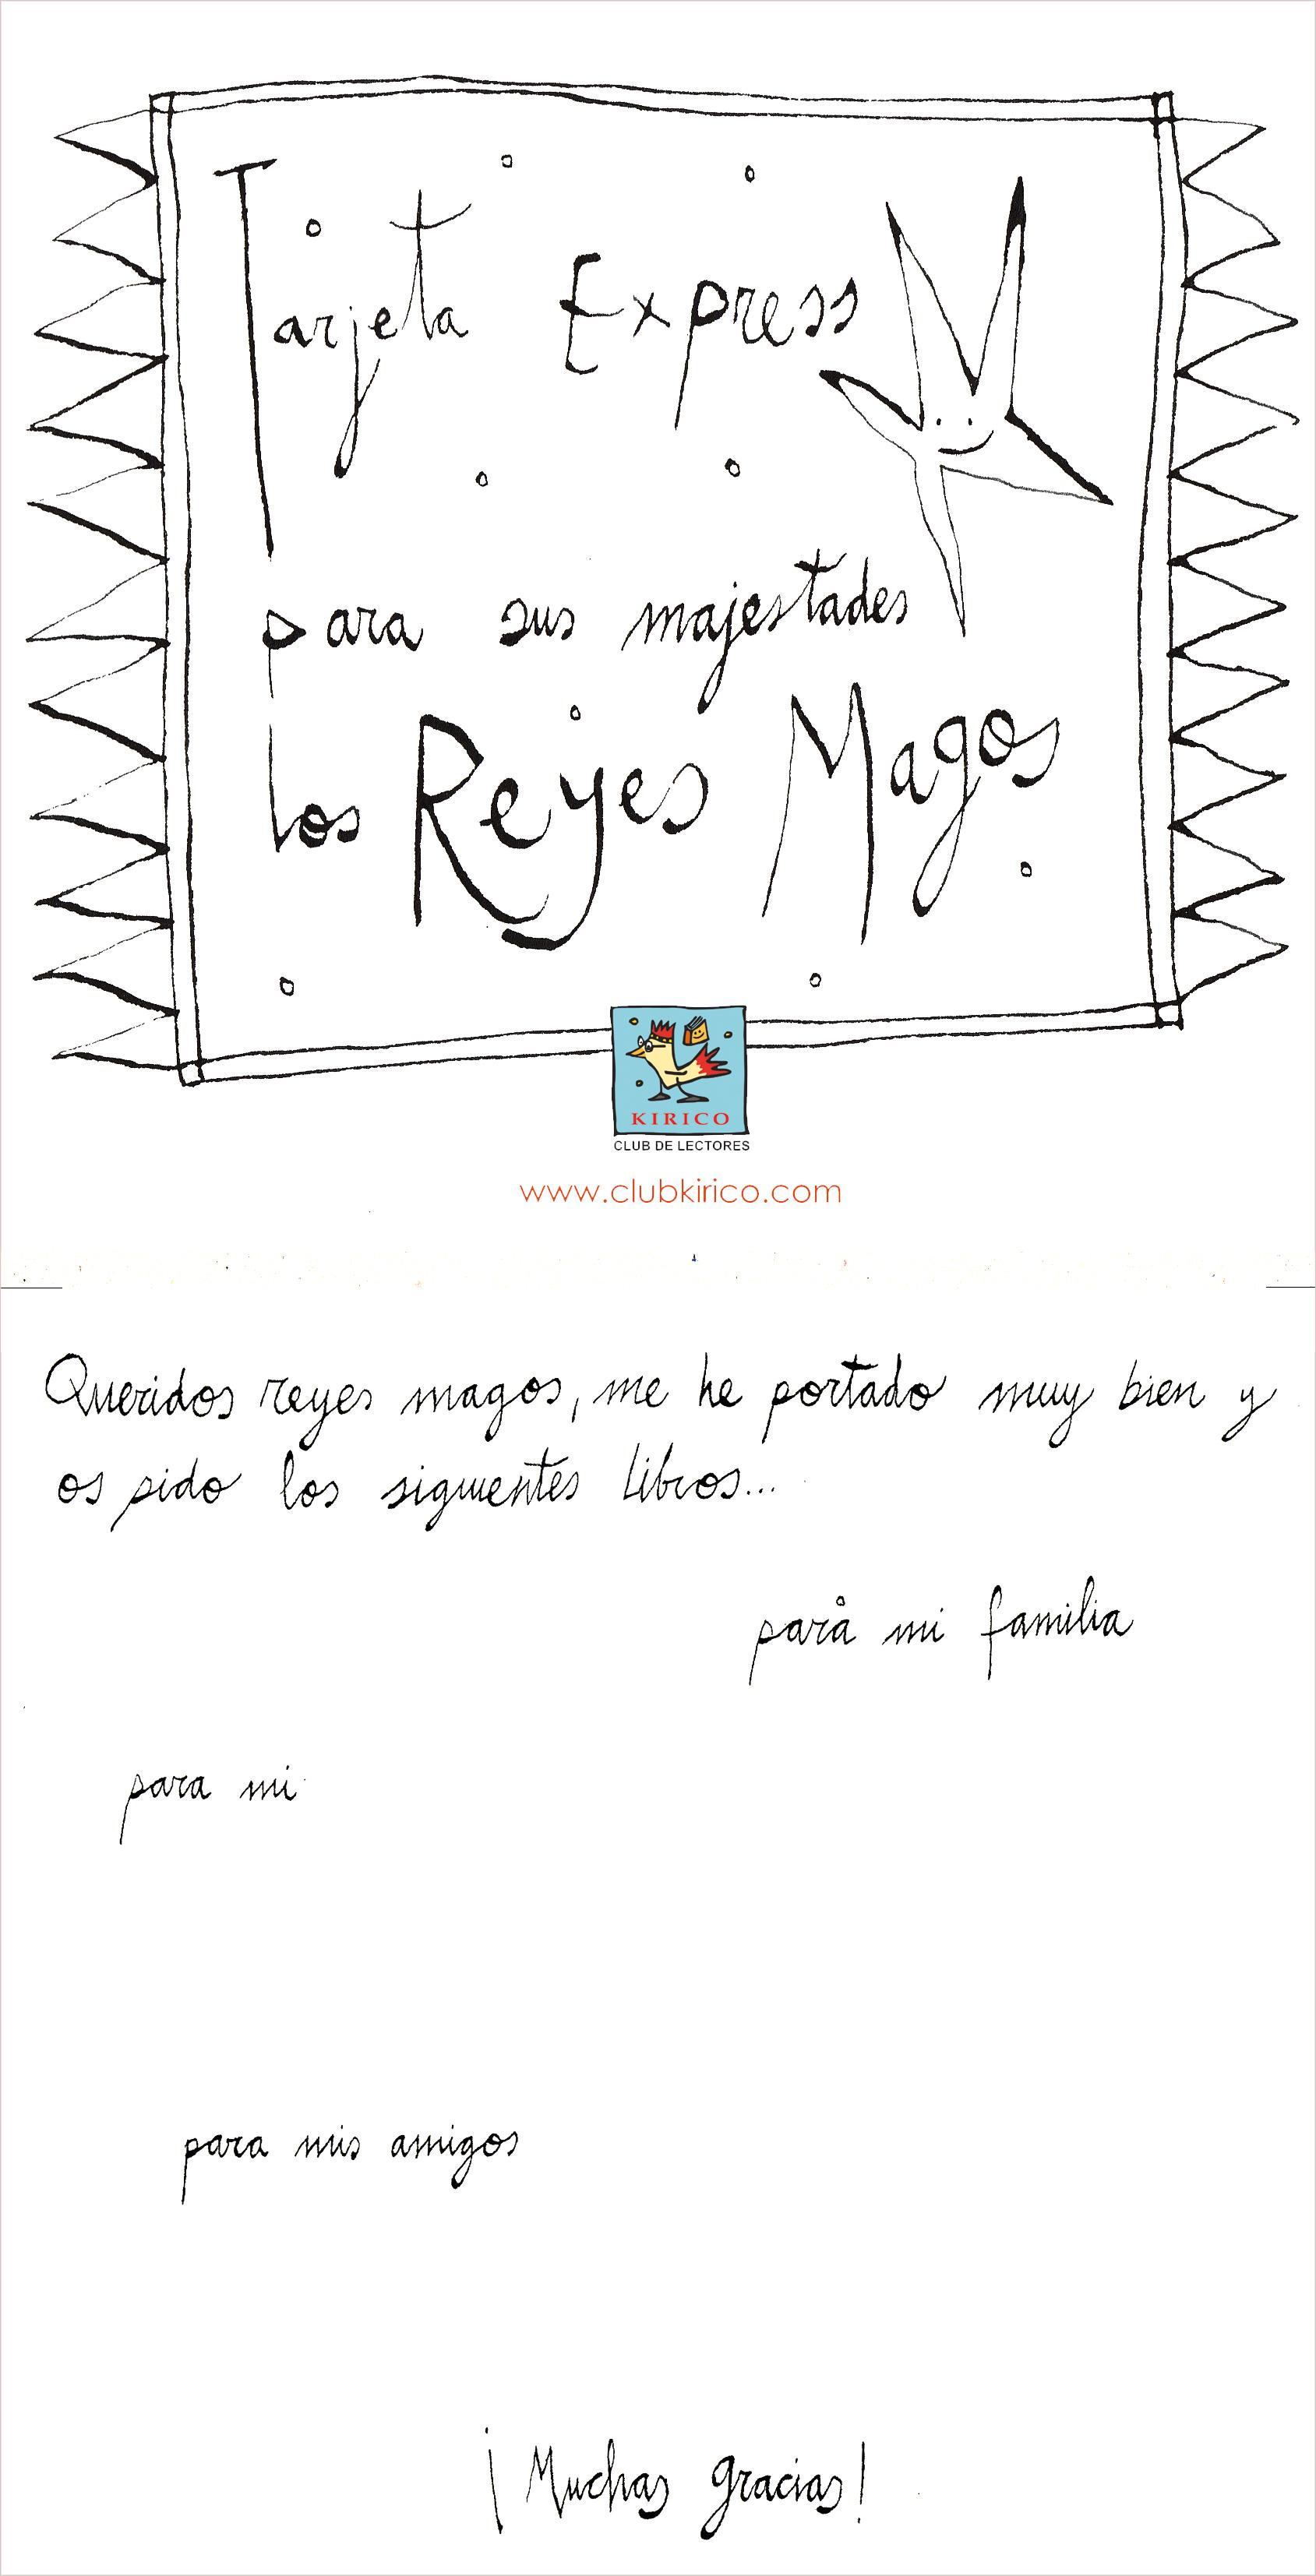 Una tarjeta express para los Reyes Magos | Club Kirico